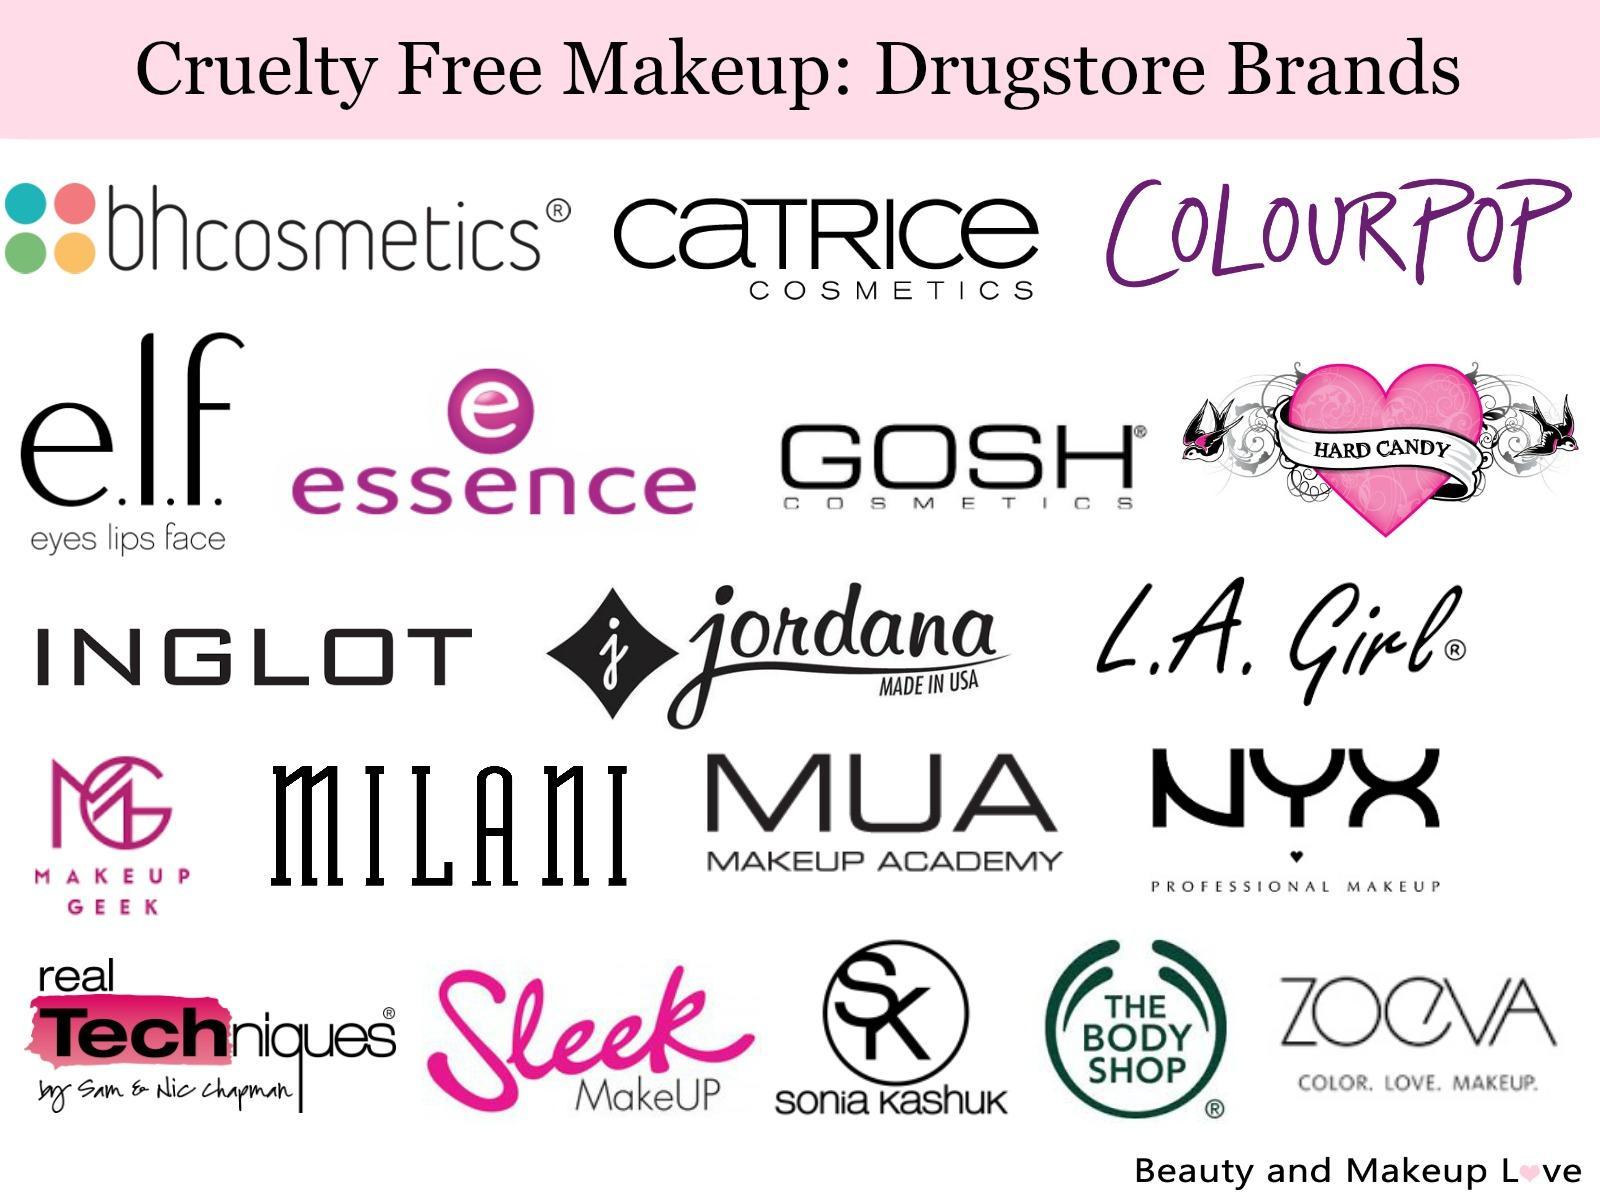 Cruelty Free Brands Makeup Skin Care